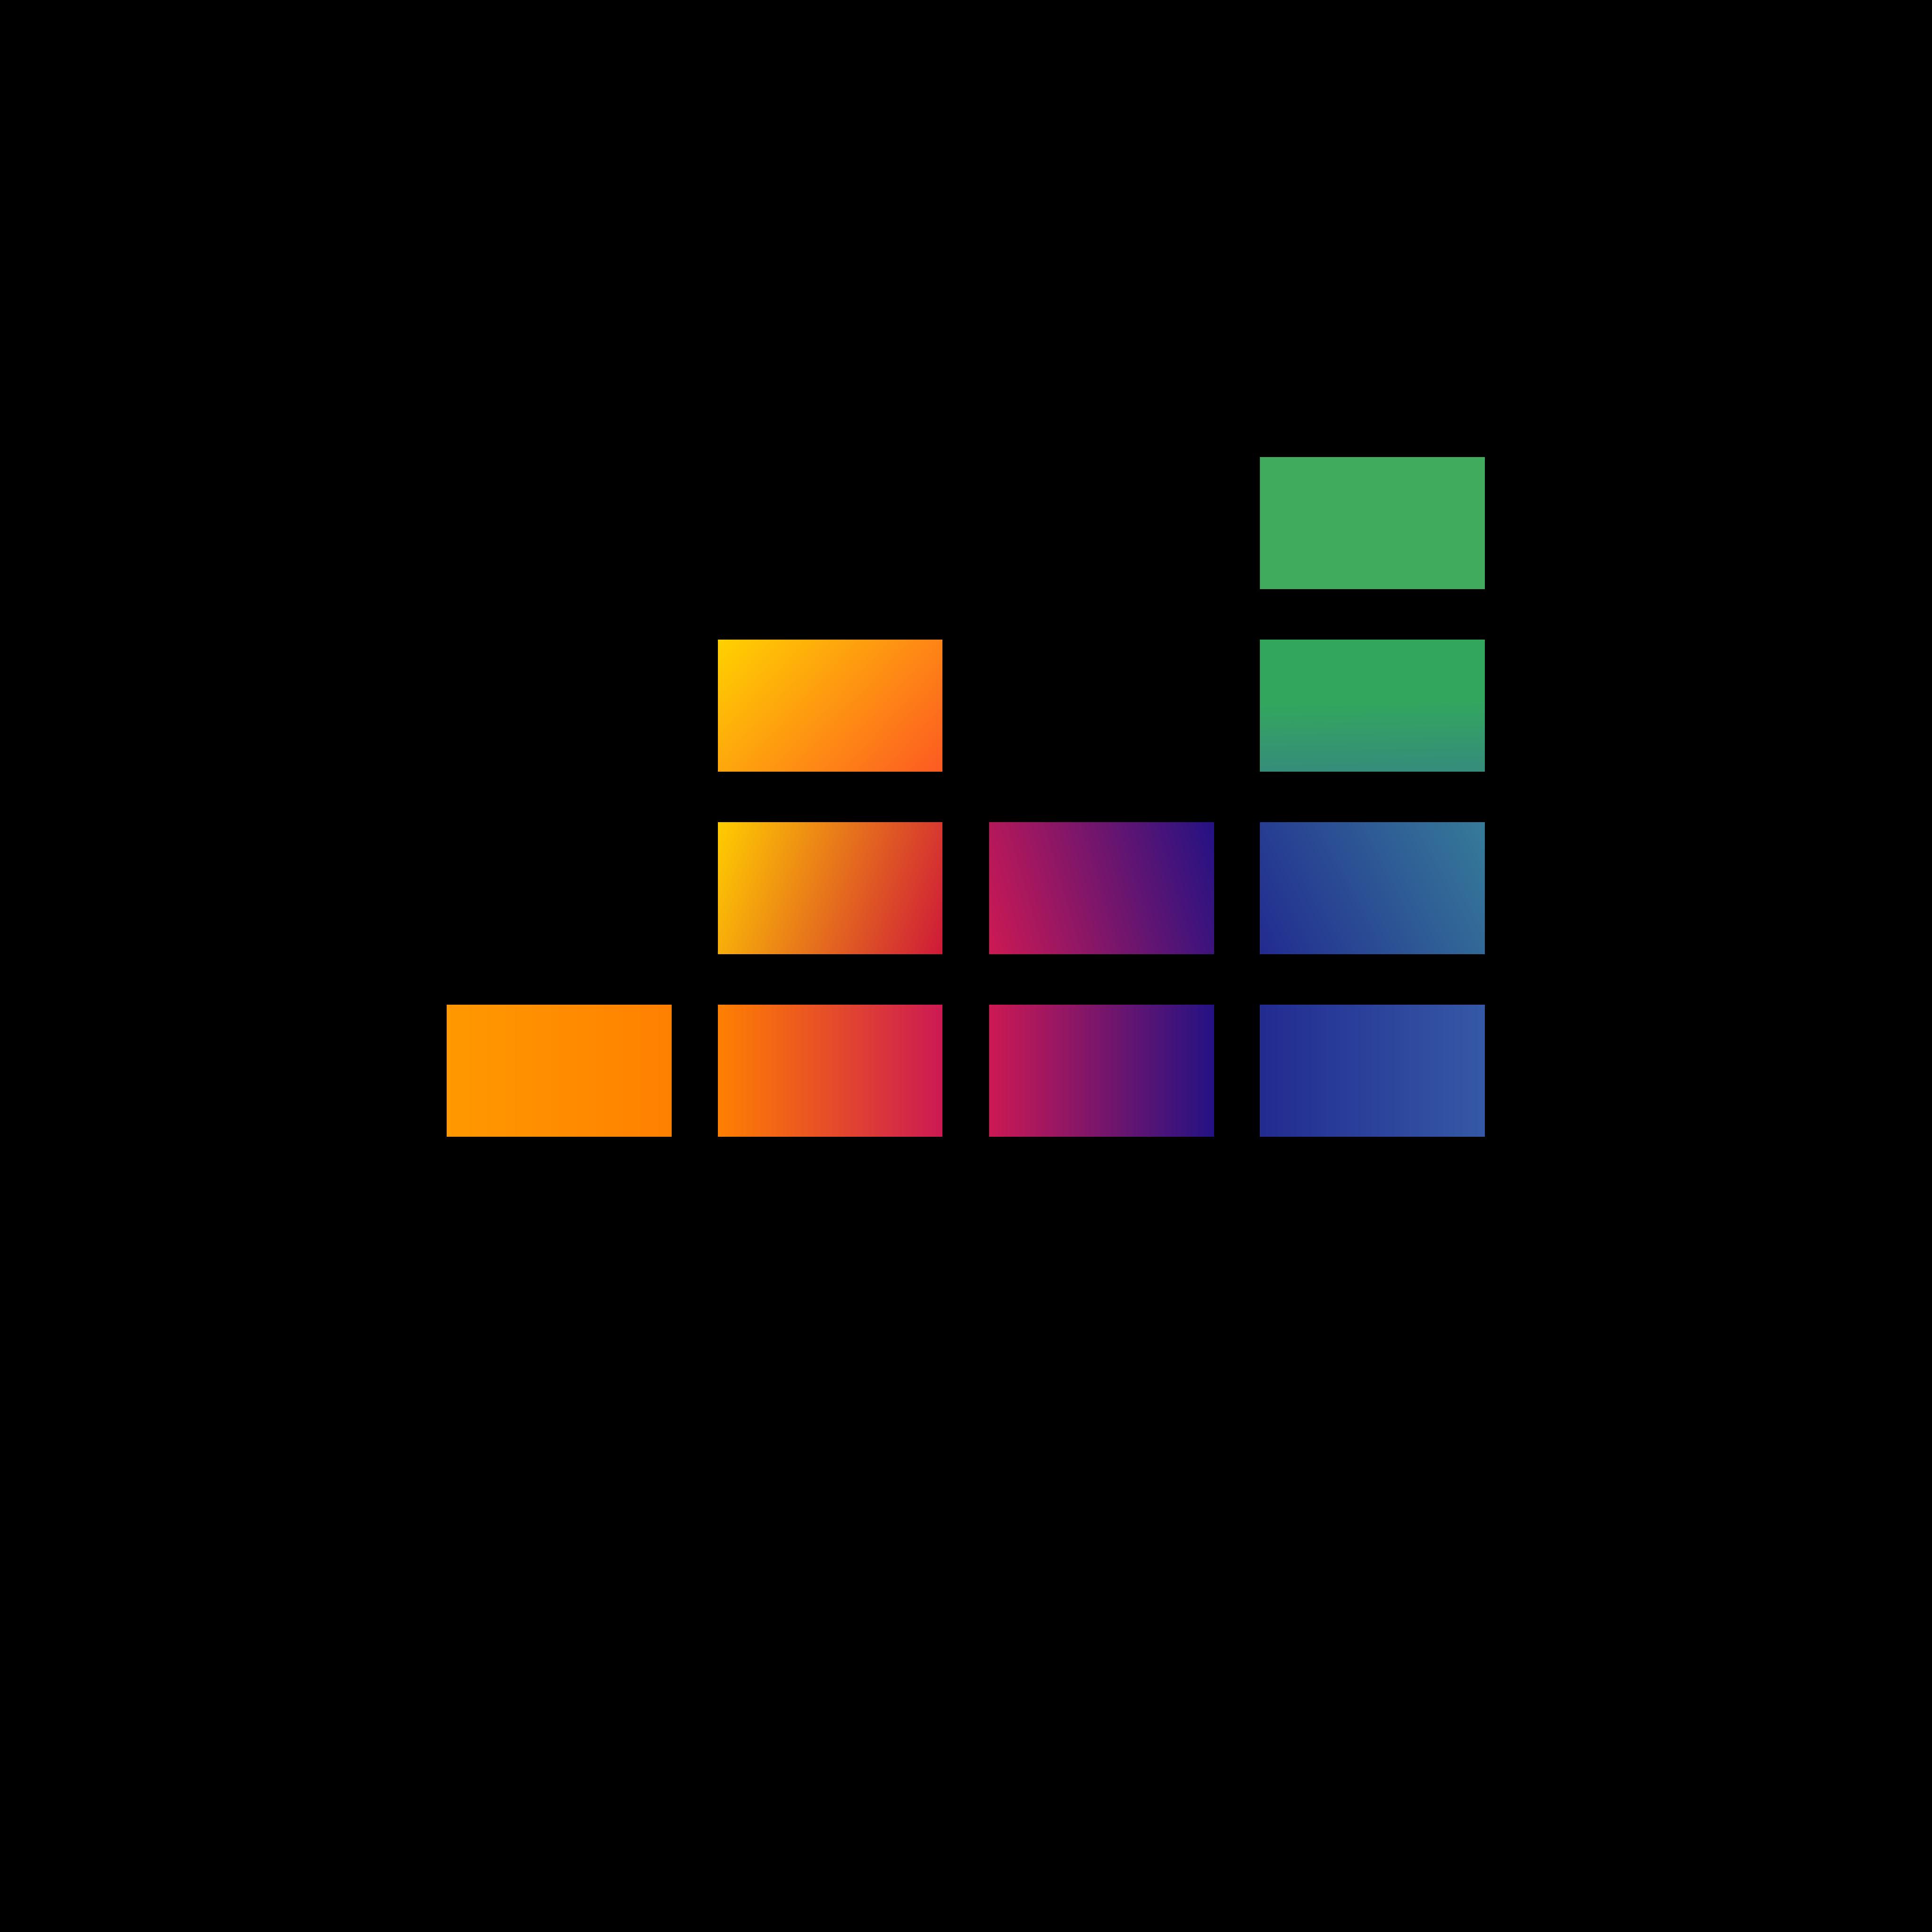 deezer logo 0 1 - Deezer Logo